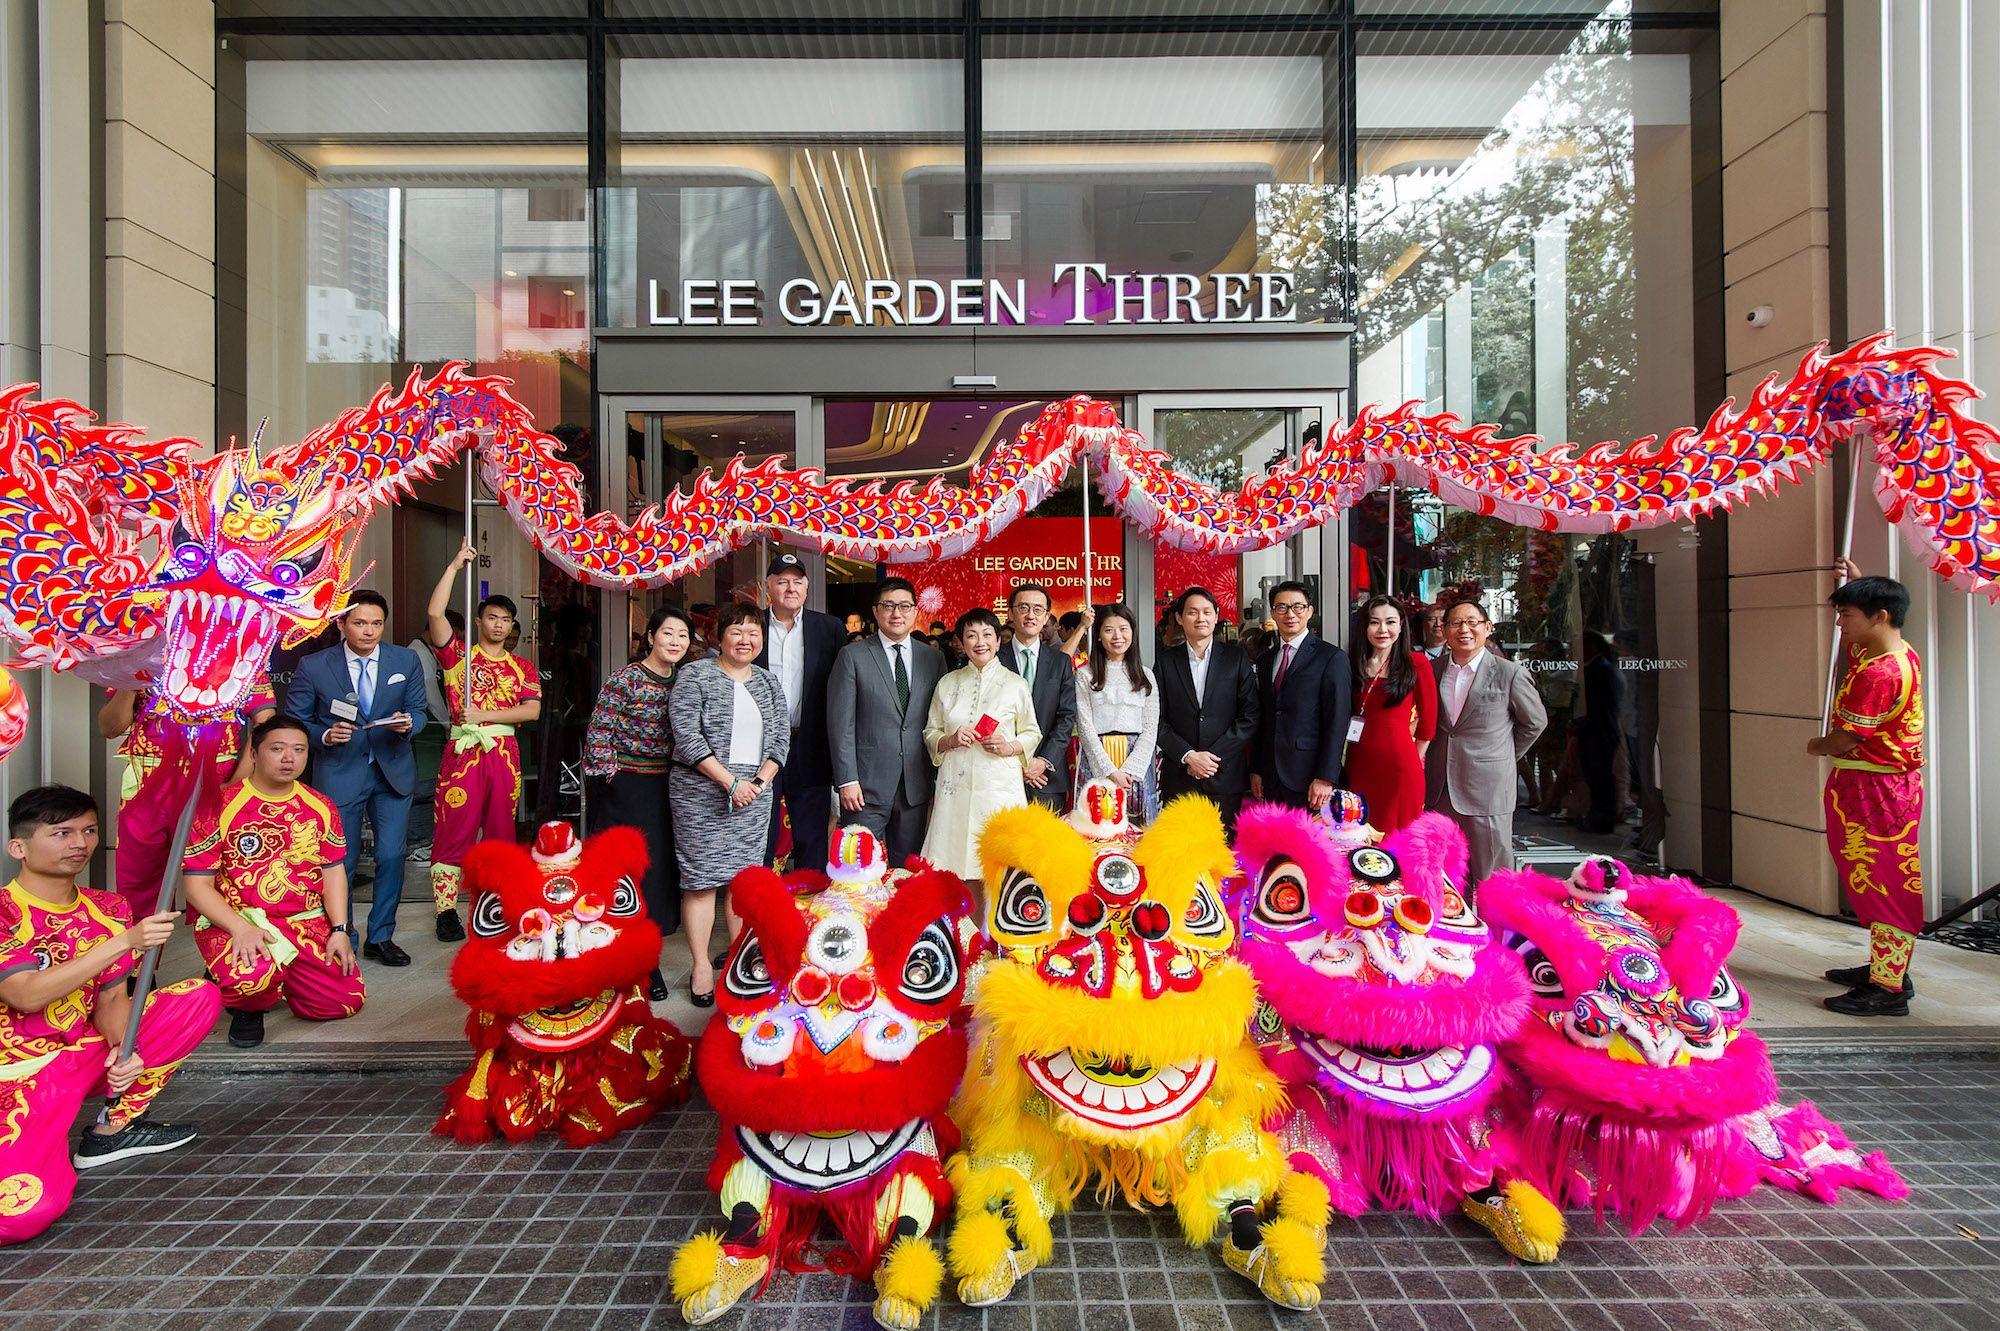 Kitty Choy, Maria Wong, J.R. Robertson; Ricky Lui, Irene Lee, Roger Hao, Jessica Yip,  Lim Eng Ping, Angus Cheng,  Tiffany Lam, Robert Lam